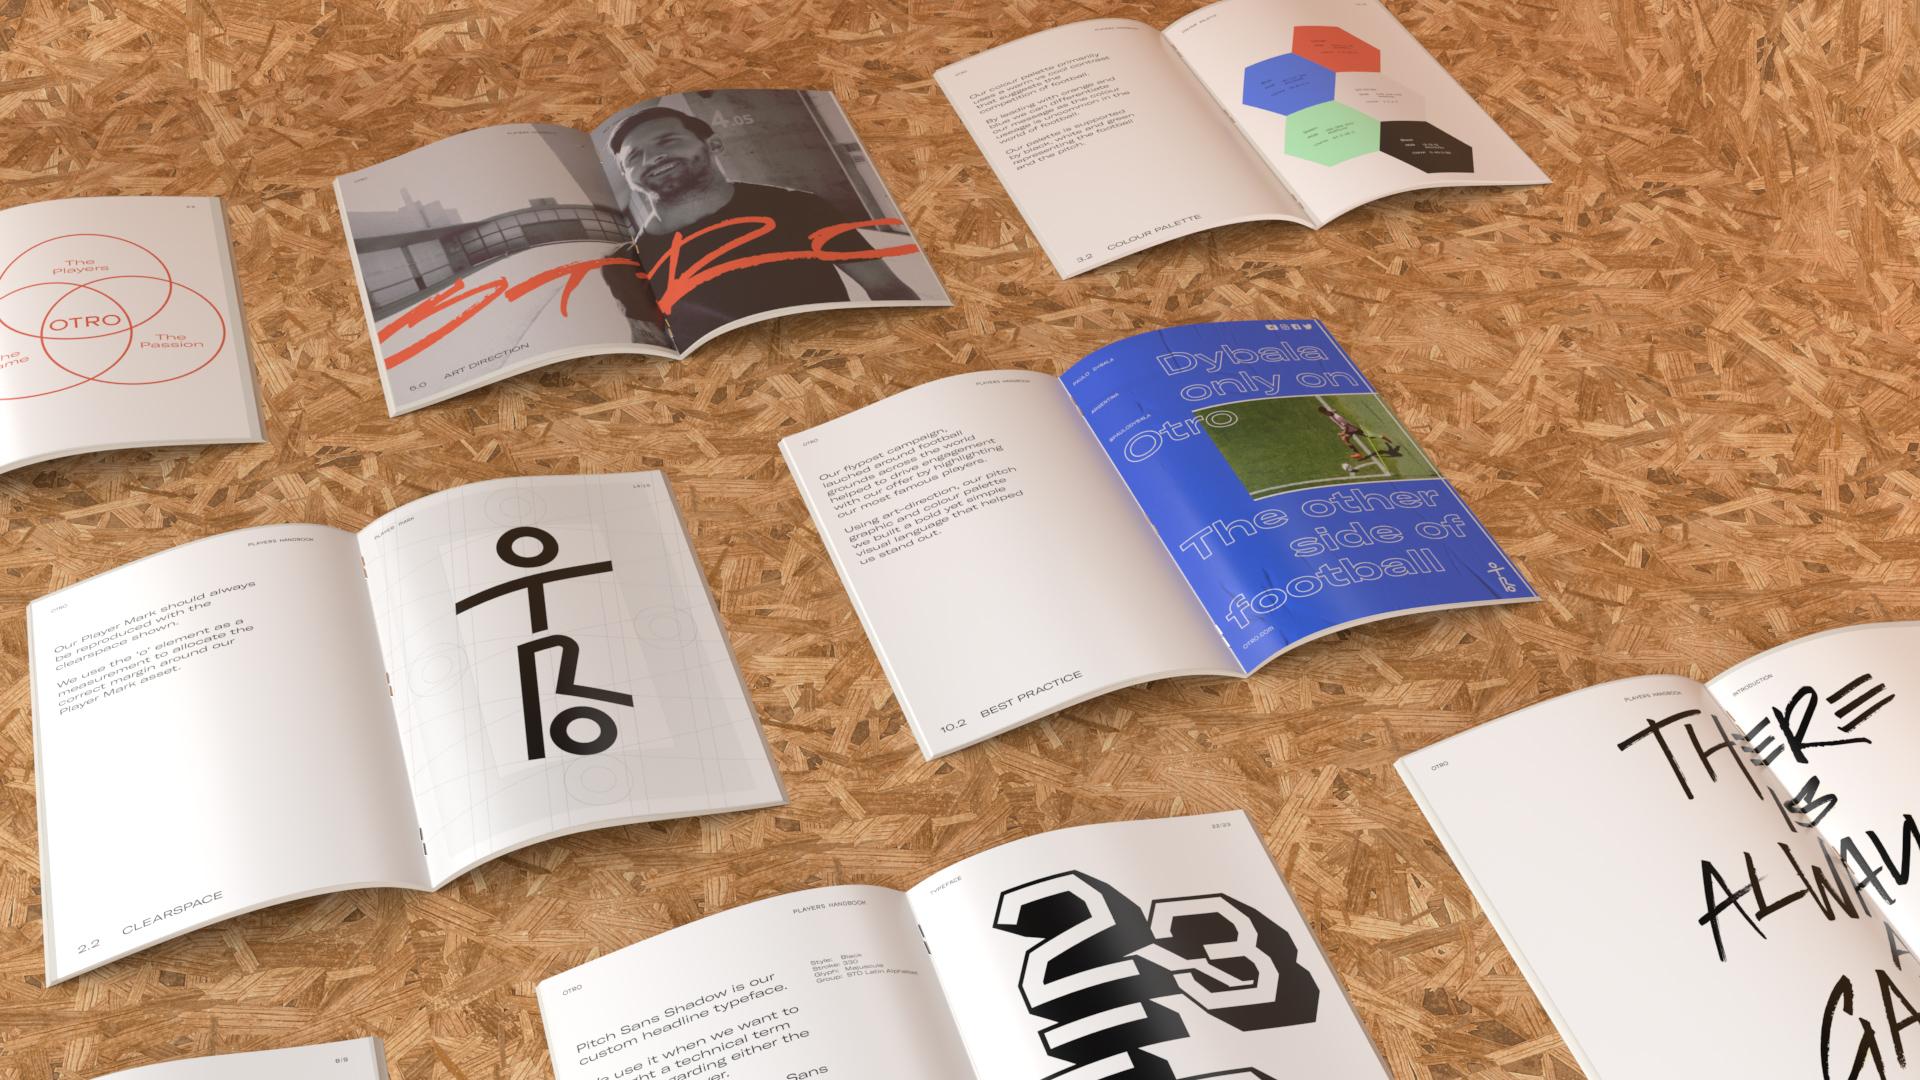 OTRO_GuidelinesBooklet